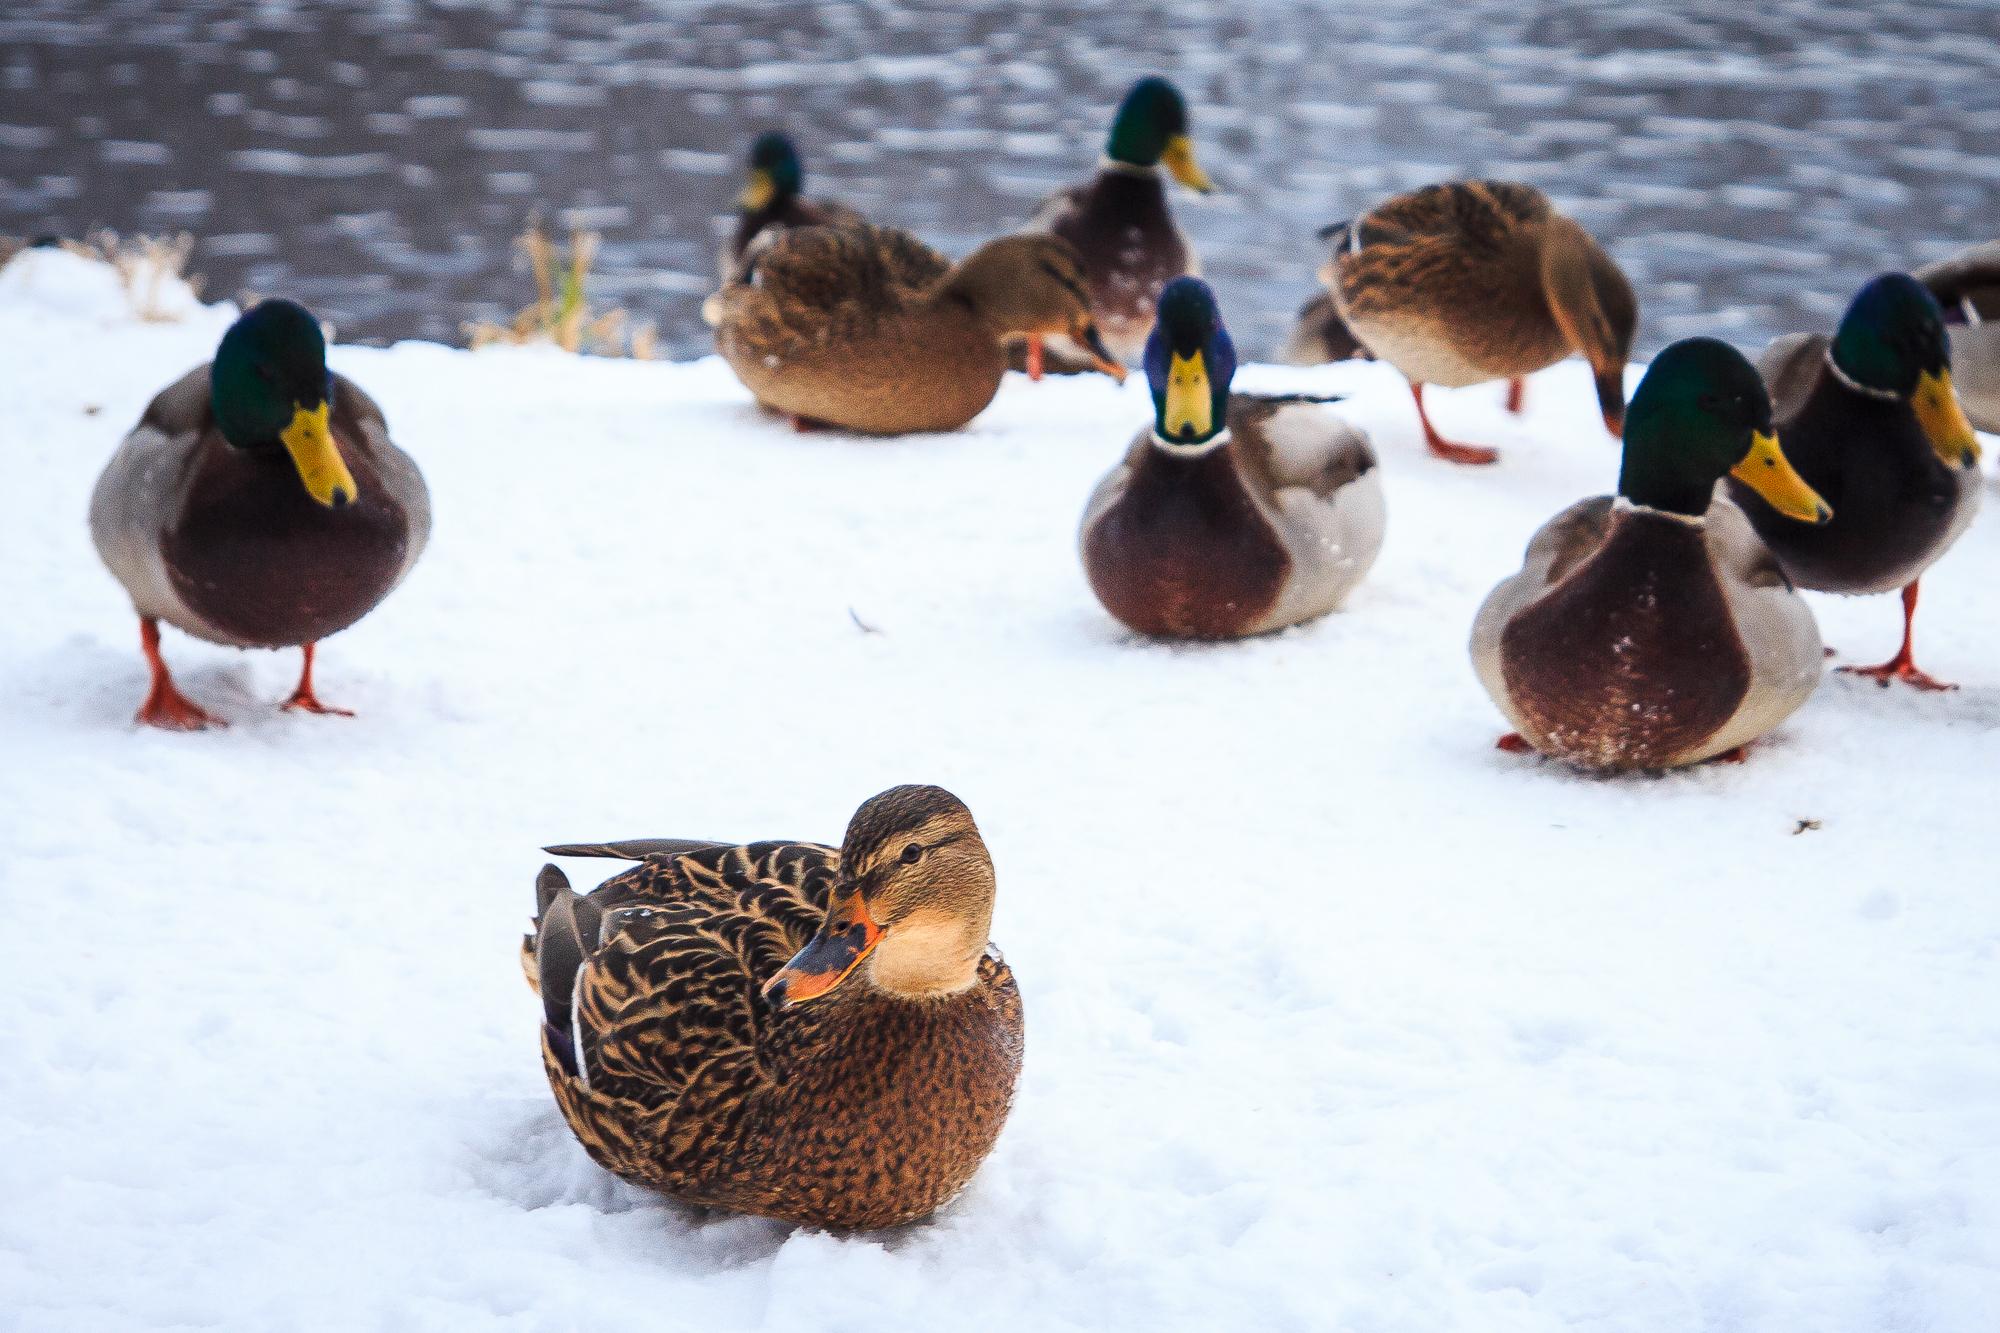 Ducks On Snow Via @Atisgailis